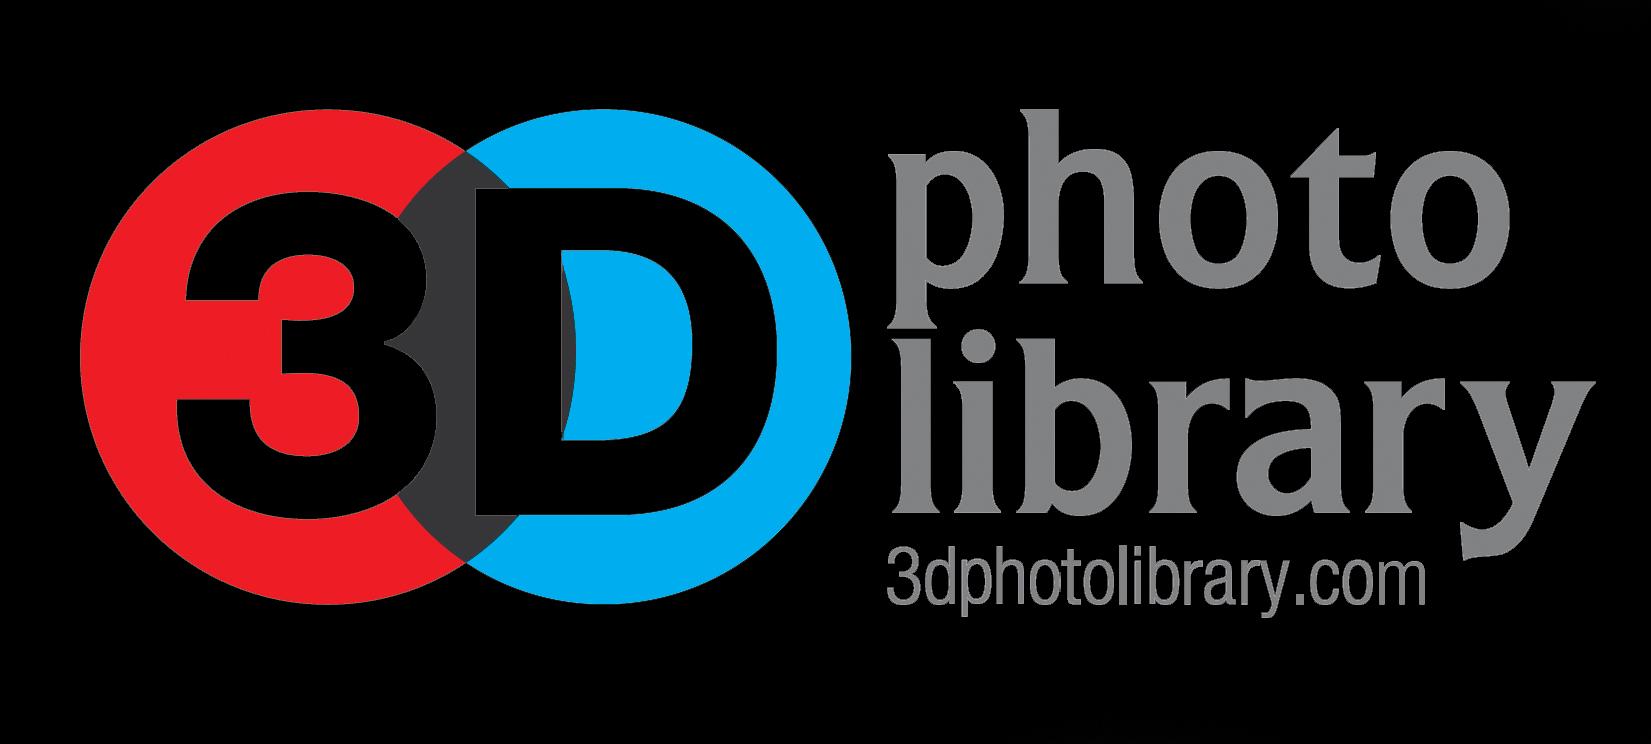 3dphotolibrary